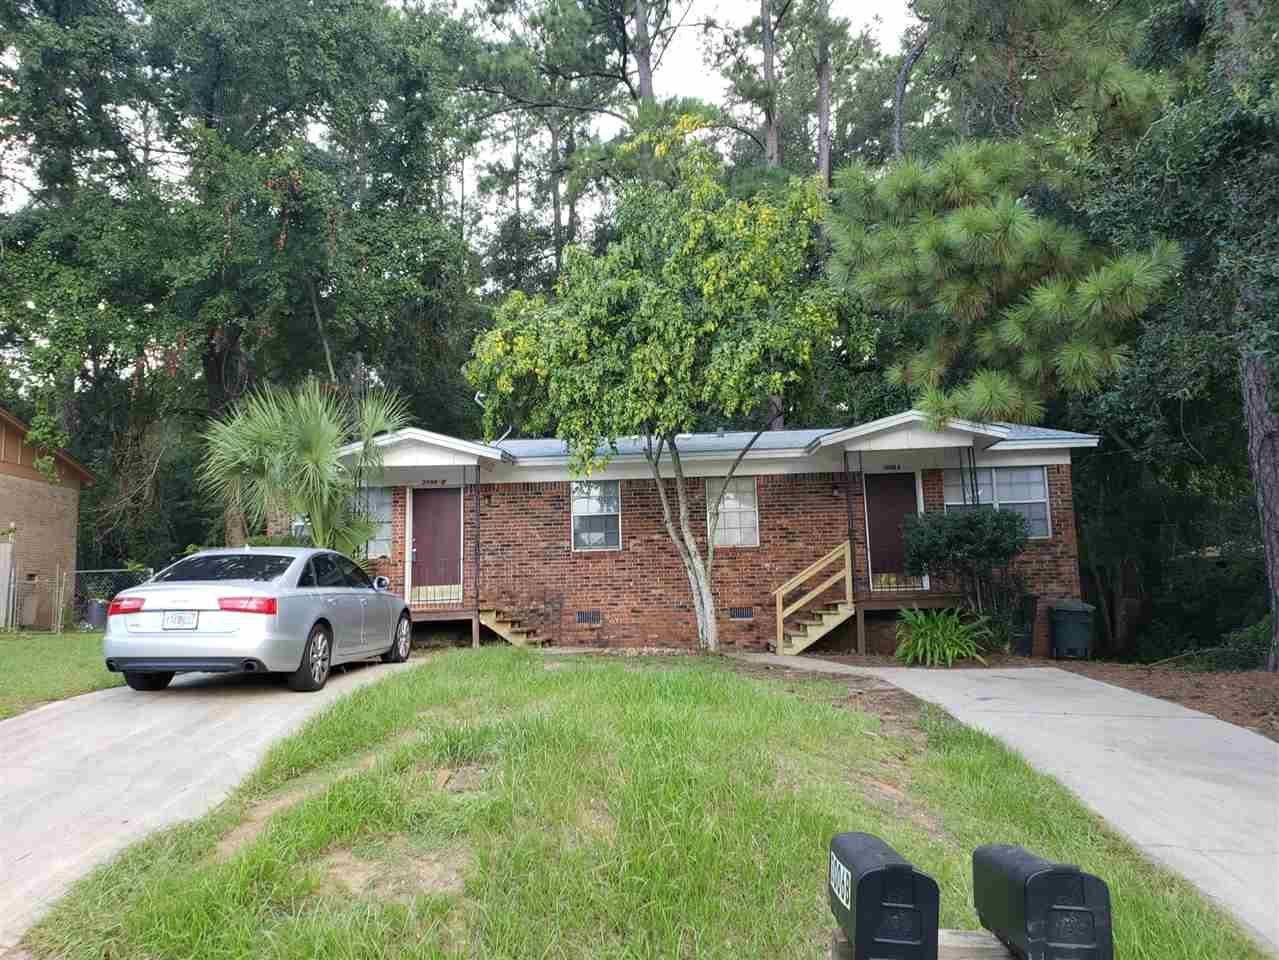 Photo for 3006 Jim Lee Road #A & B, TALLAHASSEE, FL 32301 (MLS # 321831)